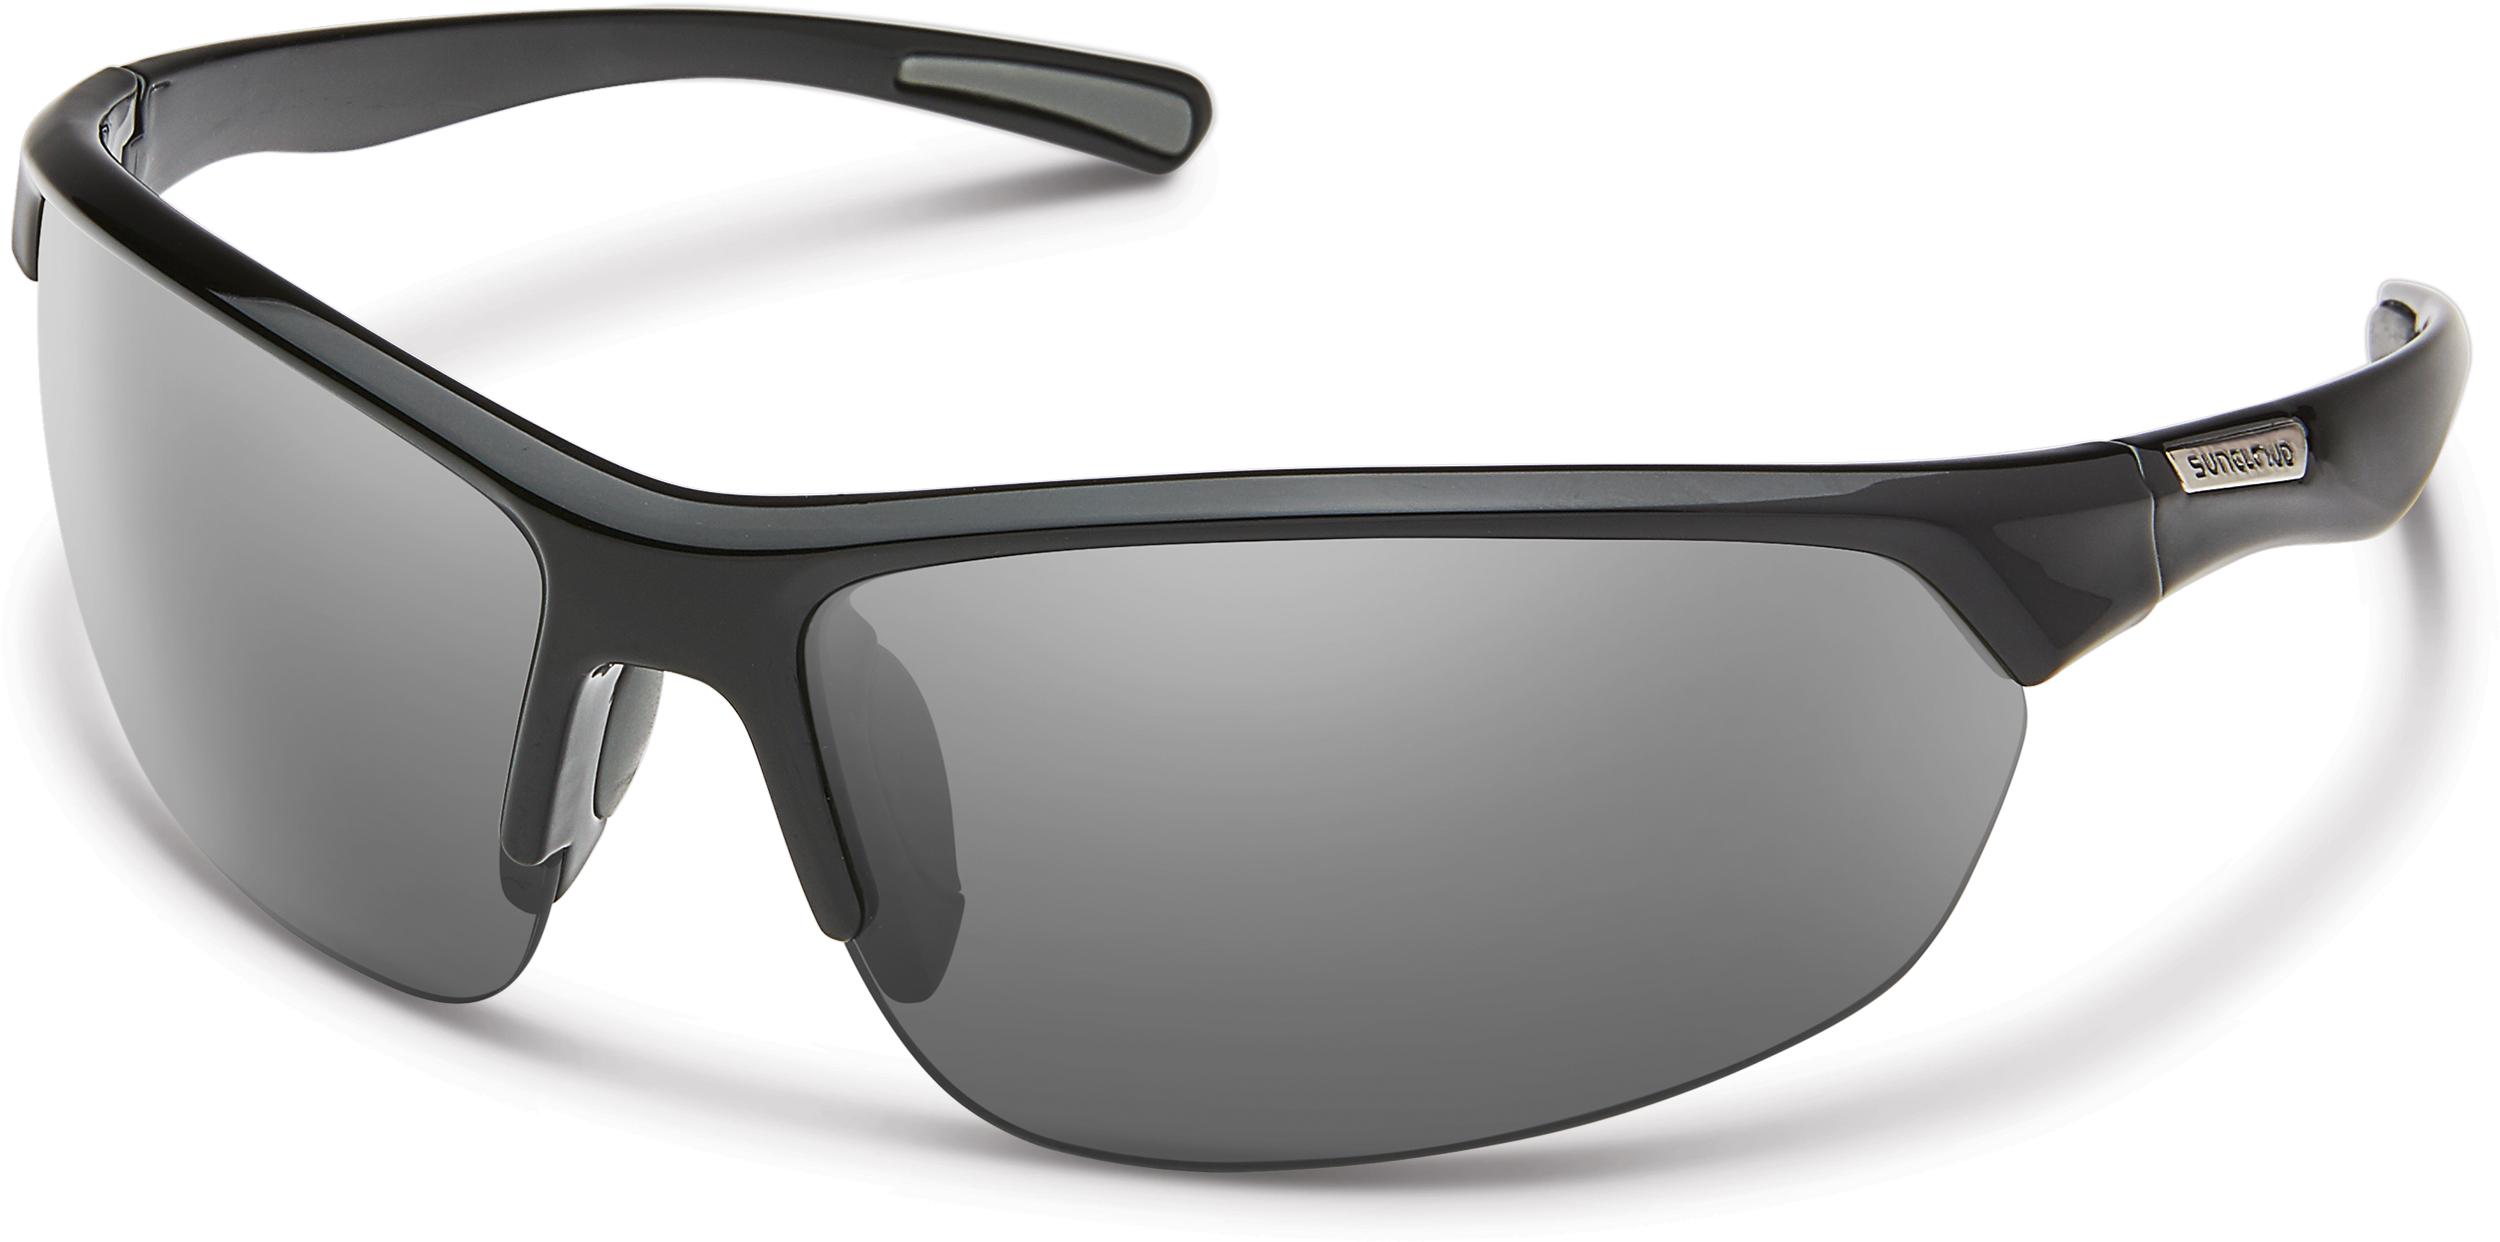 a12d74e650a Suncloud Slice Polarized Sunglasses - Unisex